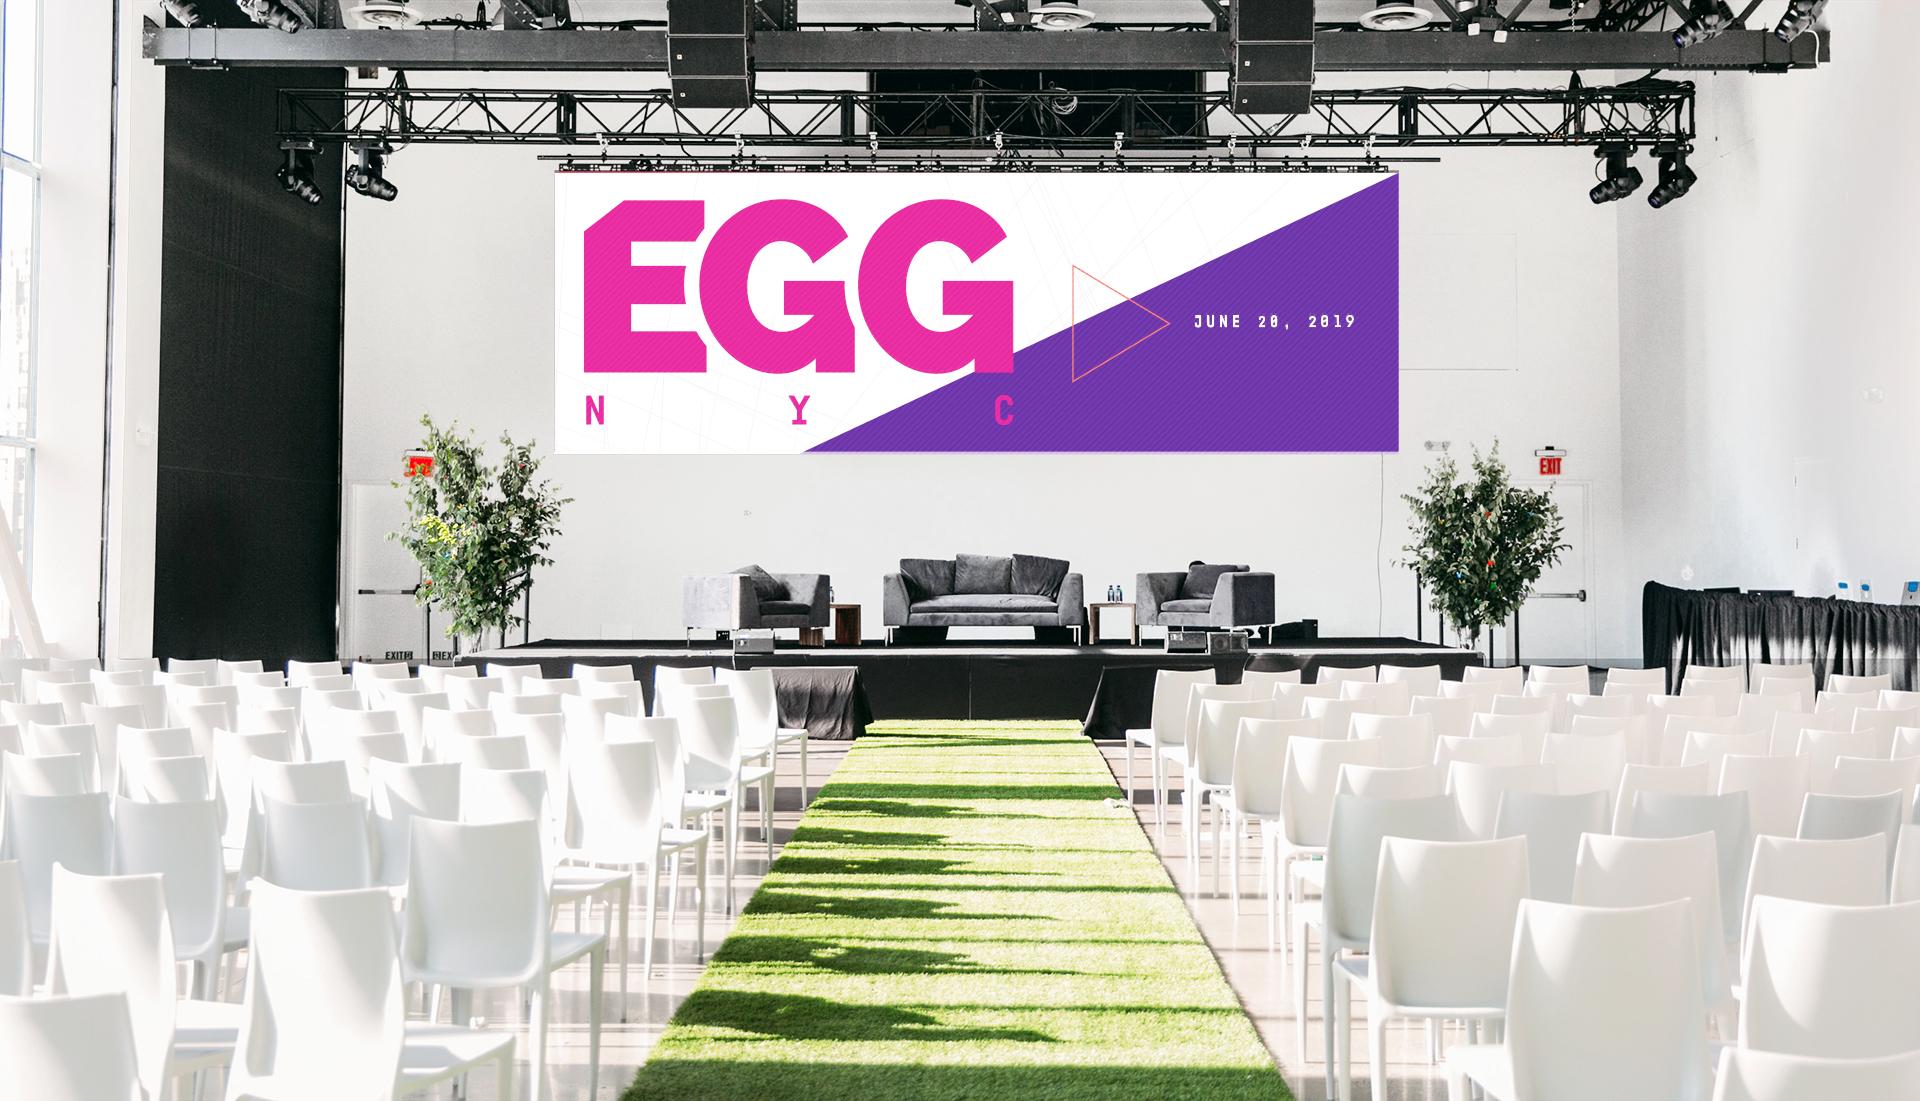 egg_stage.jpg